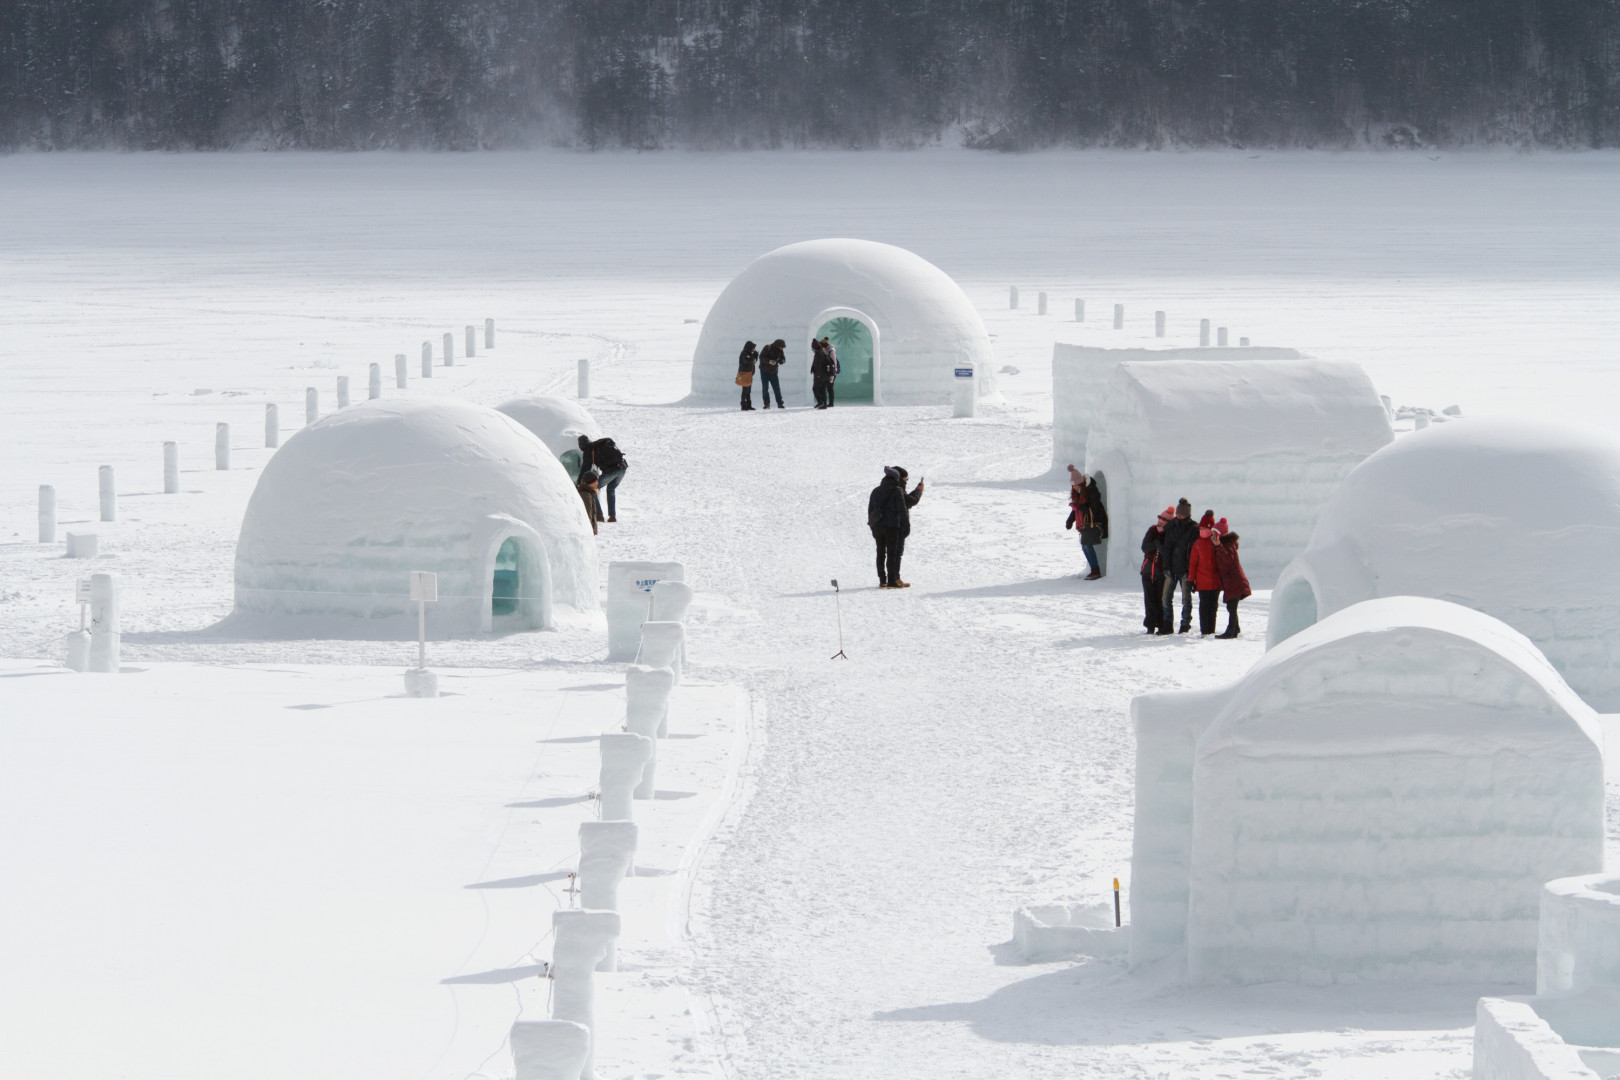 Kotan around Lake Shikaribetsu unique to winter appearing in an ice-bound world